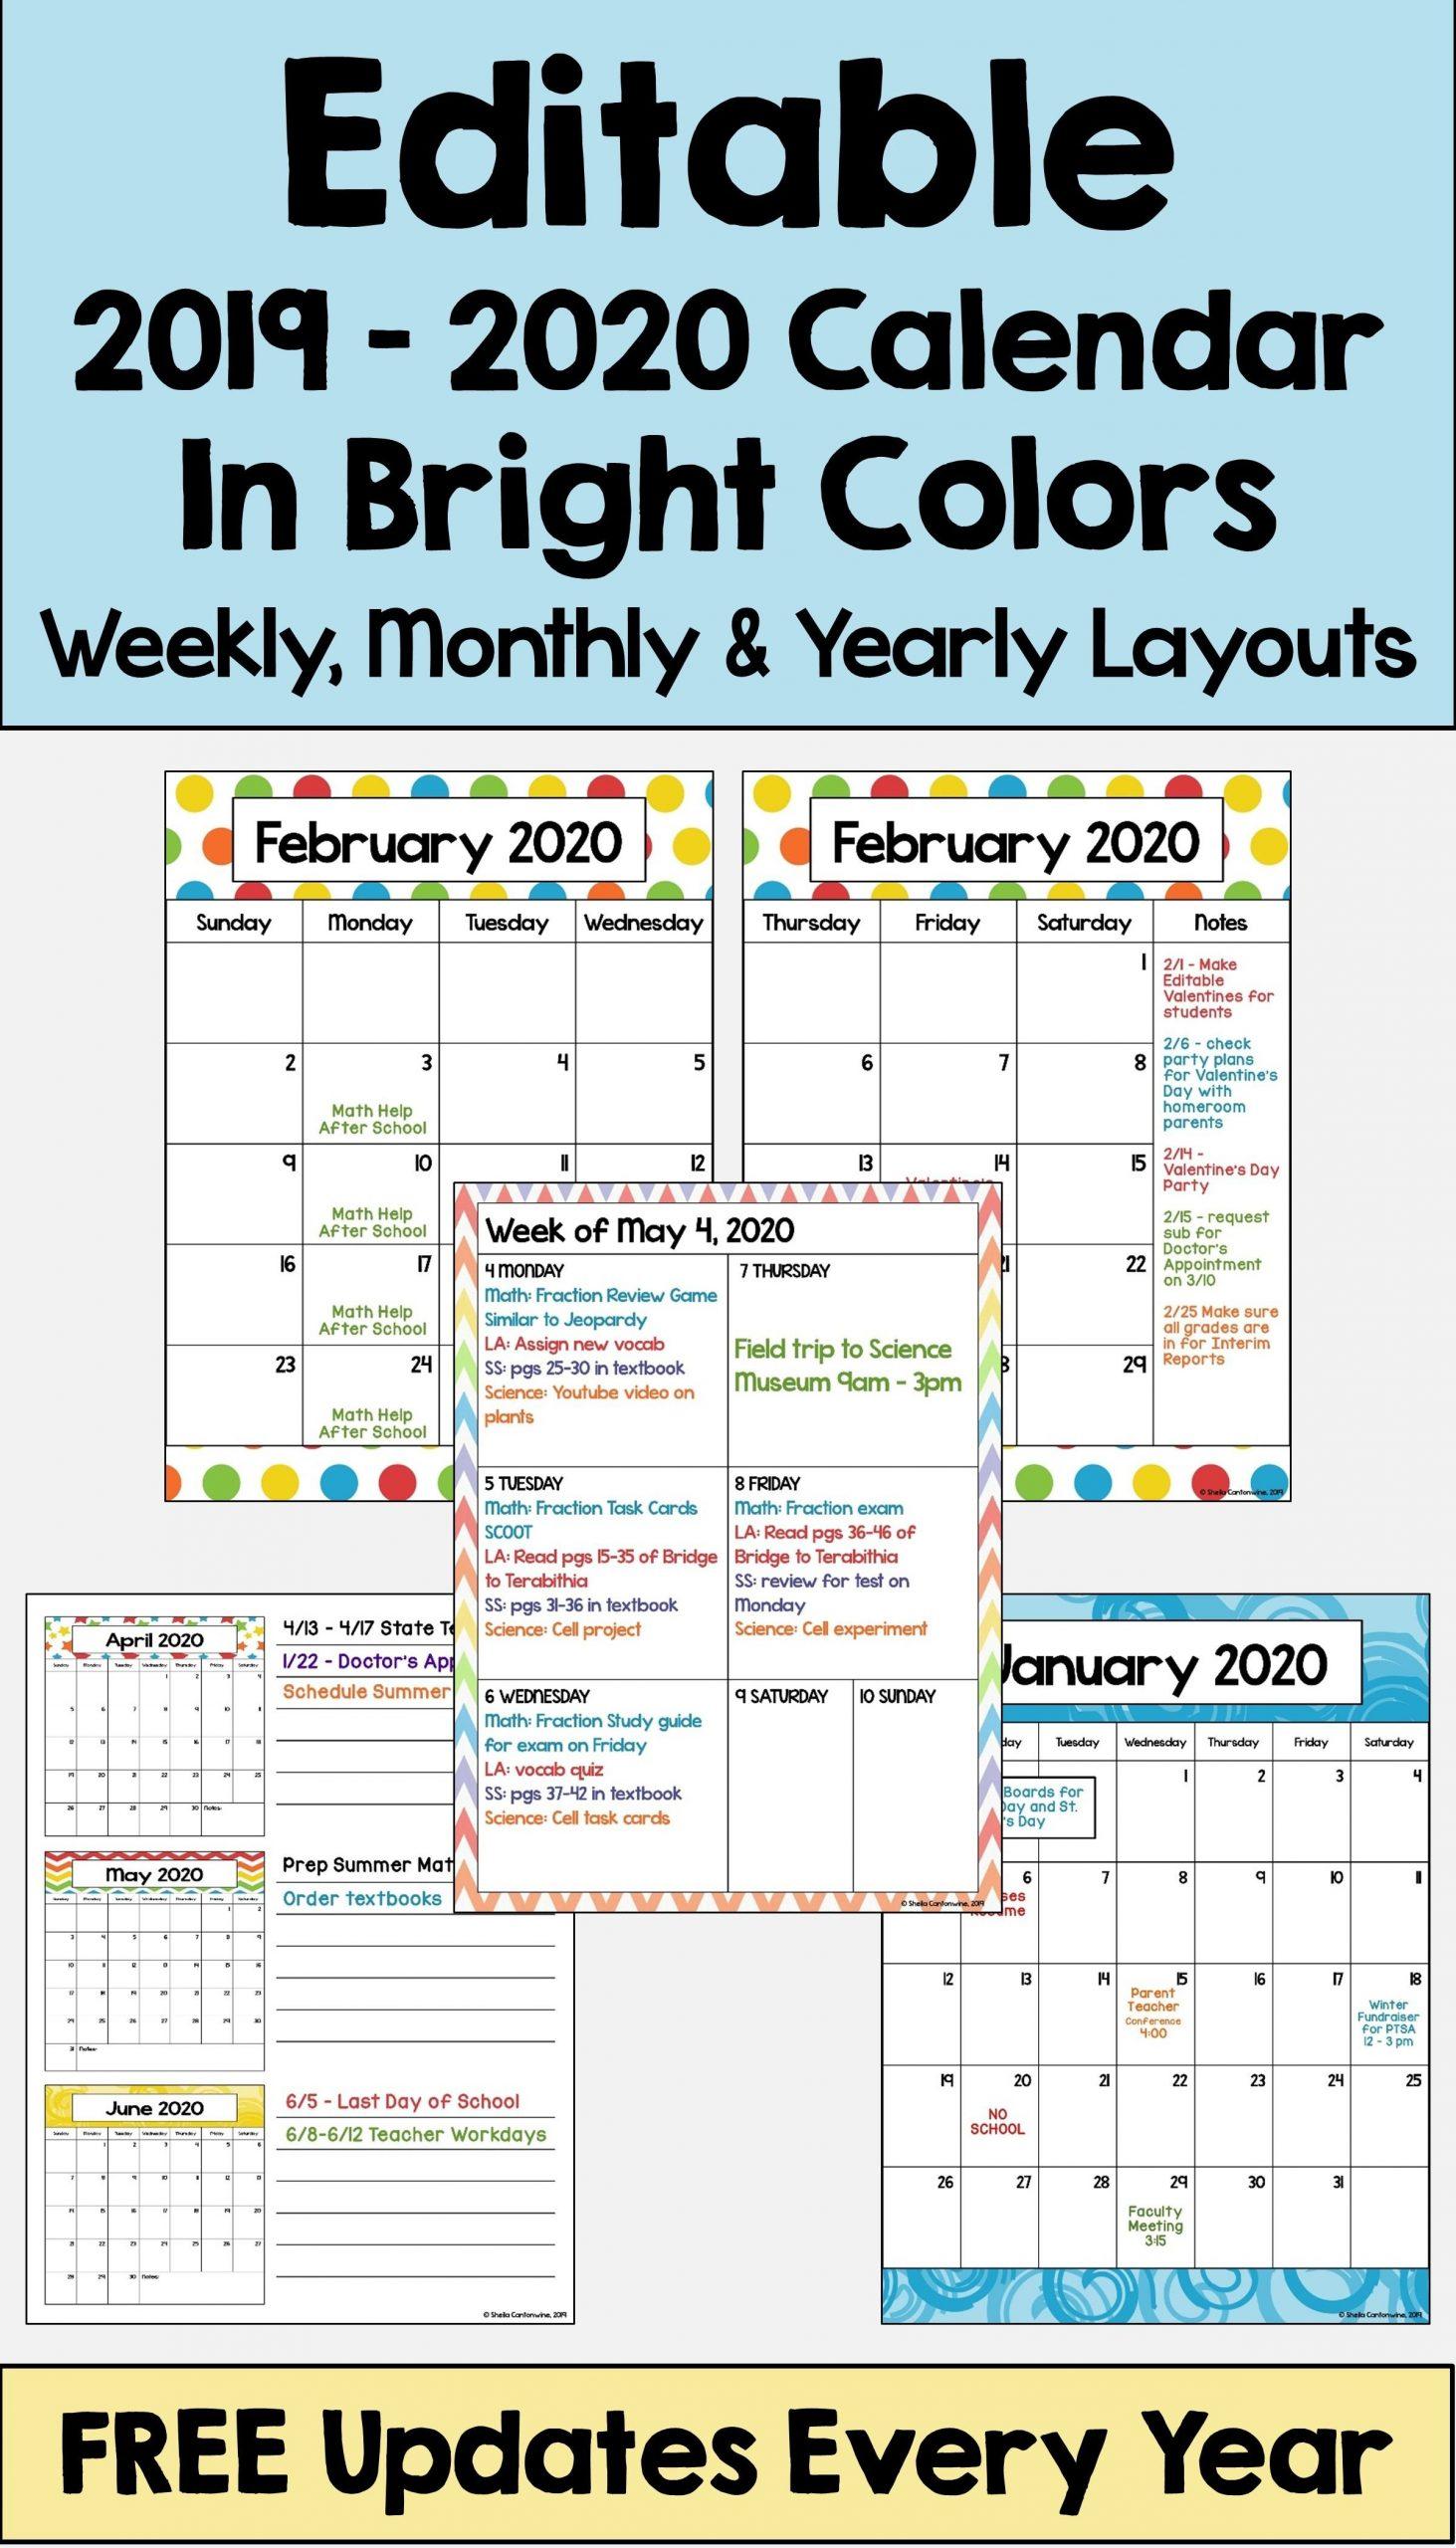 2020-2021 Calendar Printable And Editable With Free Free Editable Calendars For School